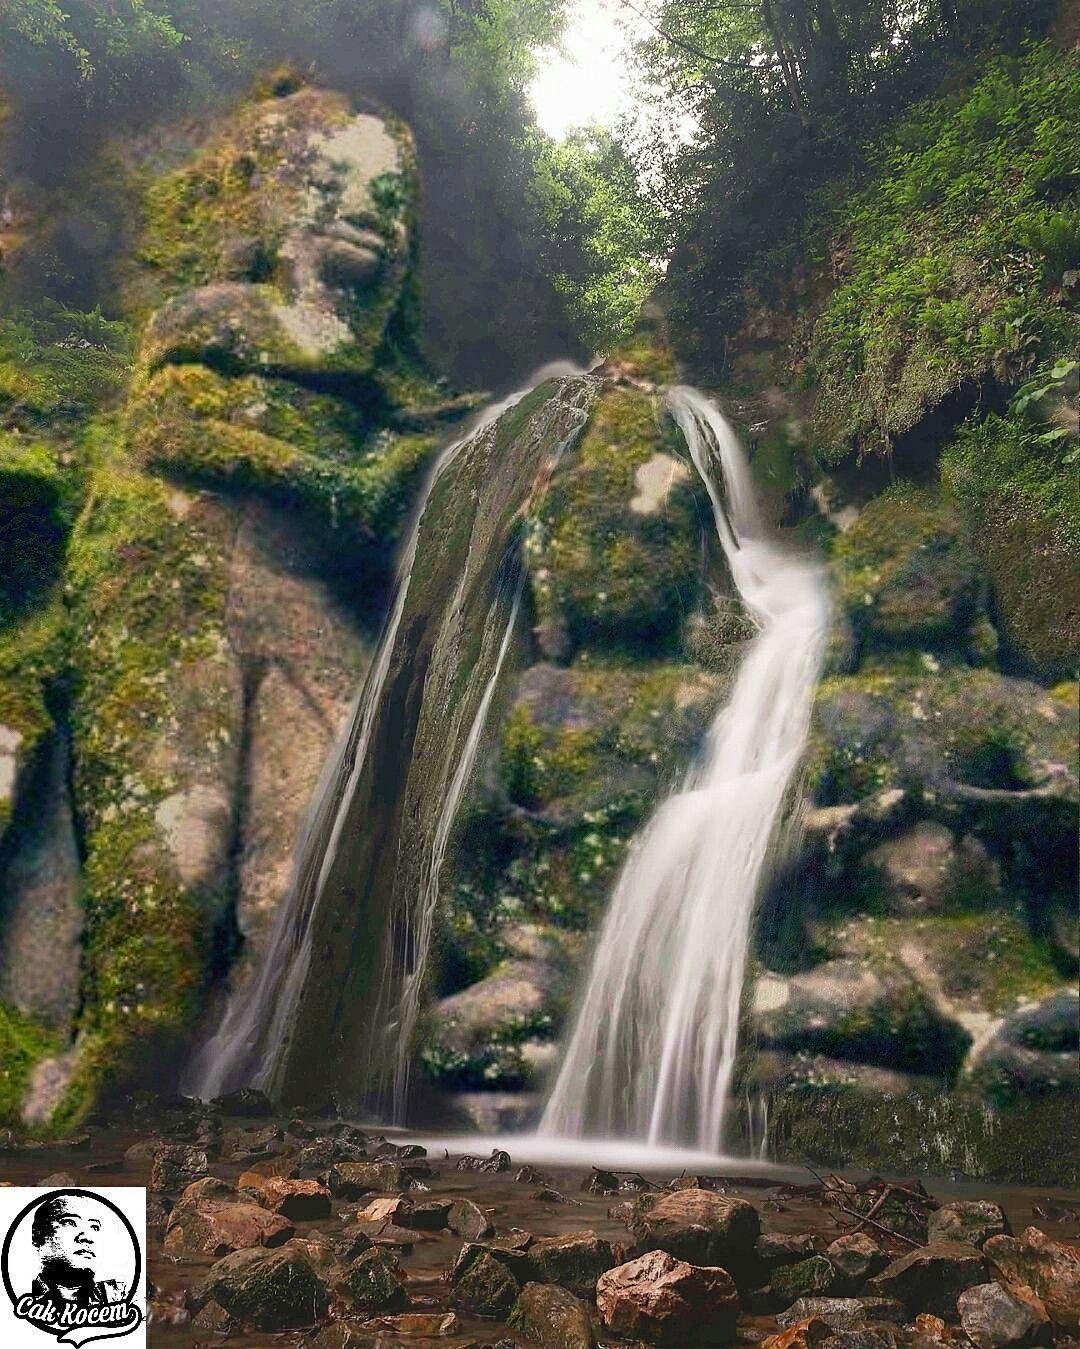 photomanipulation landscape sculpture waterfall airterjun patung cakkocem ruin